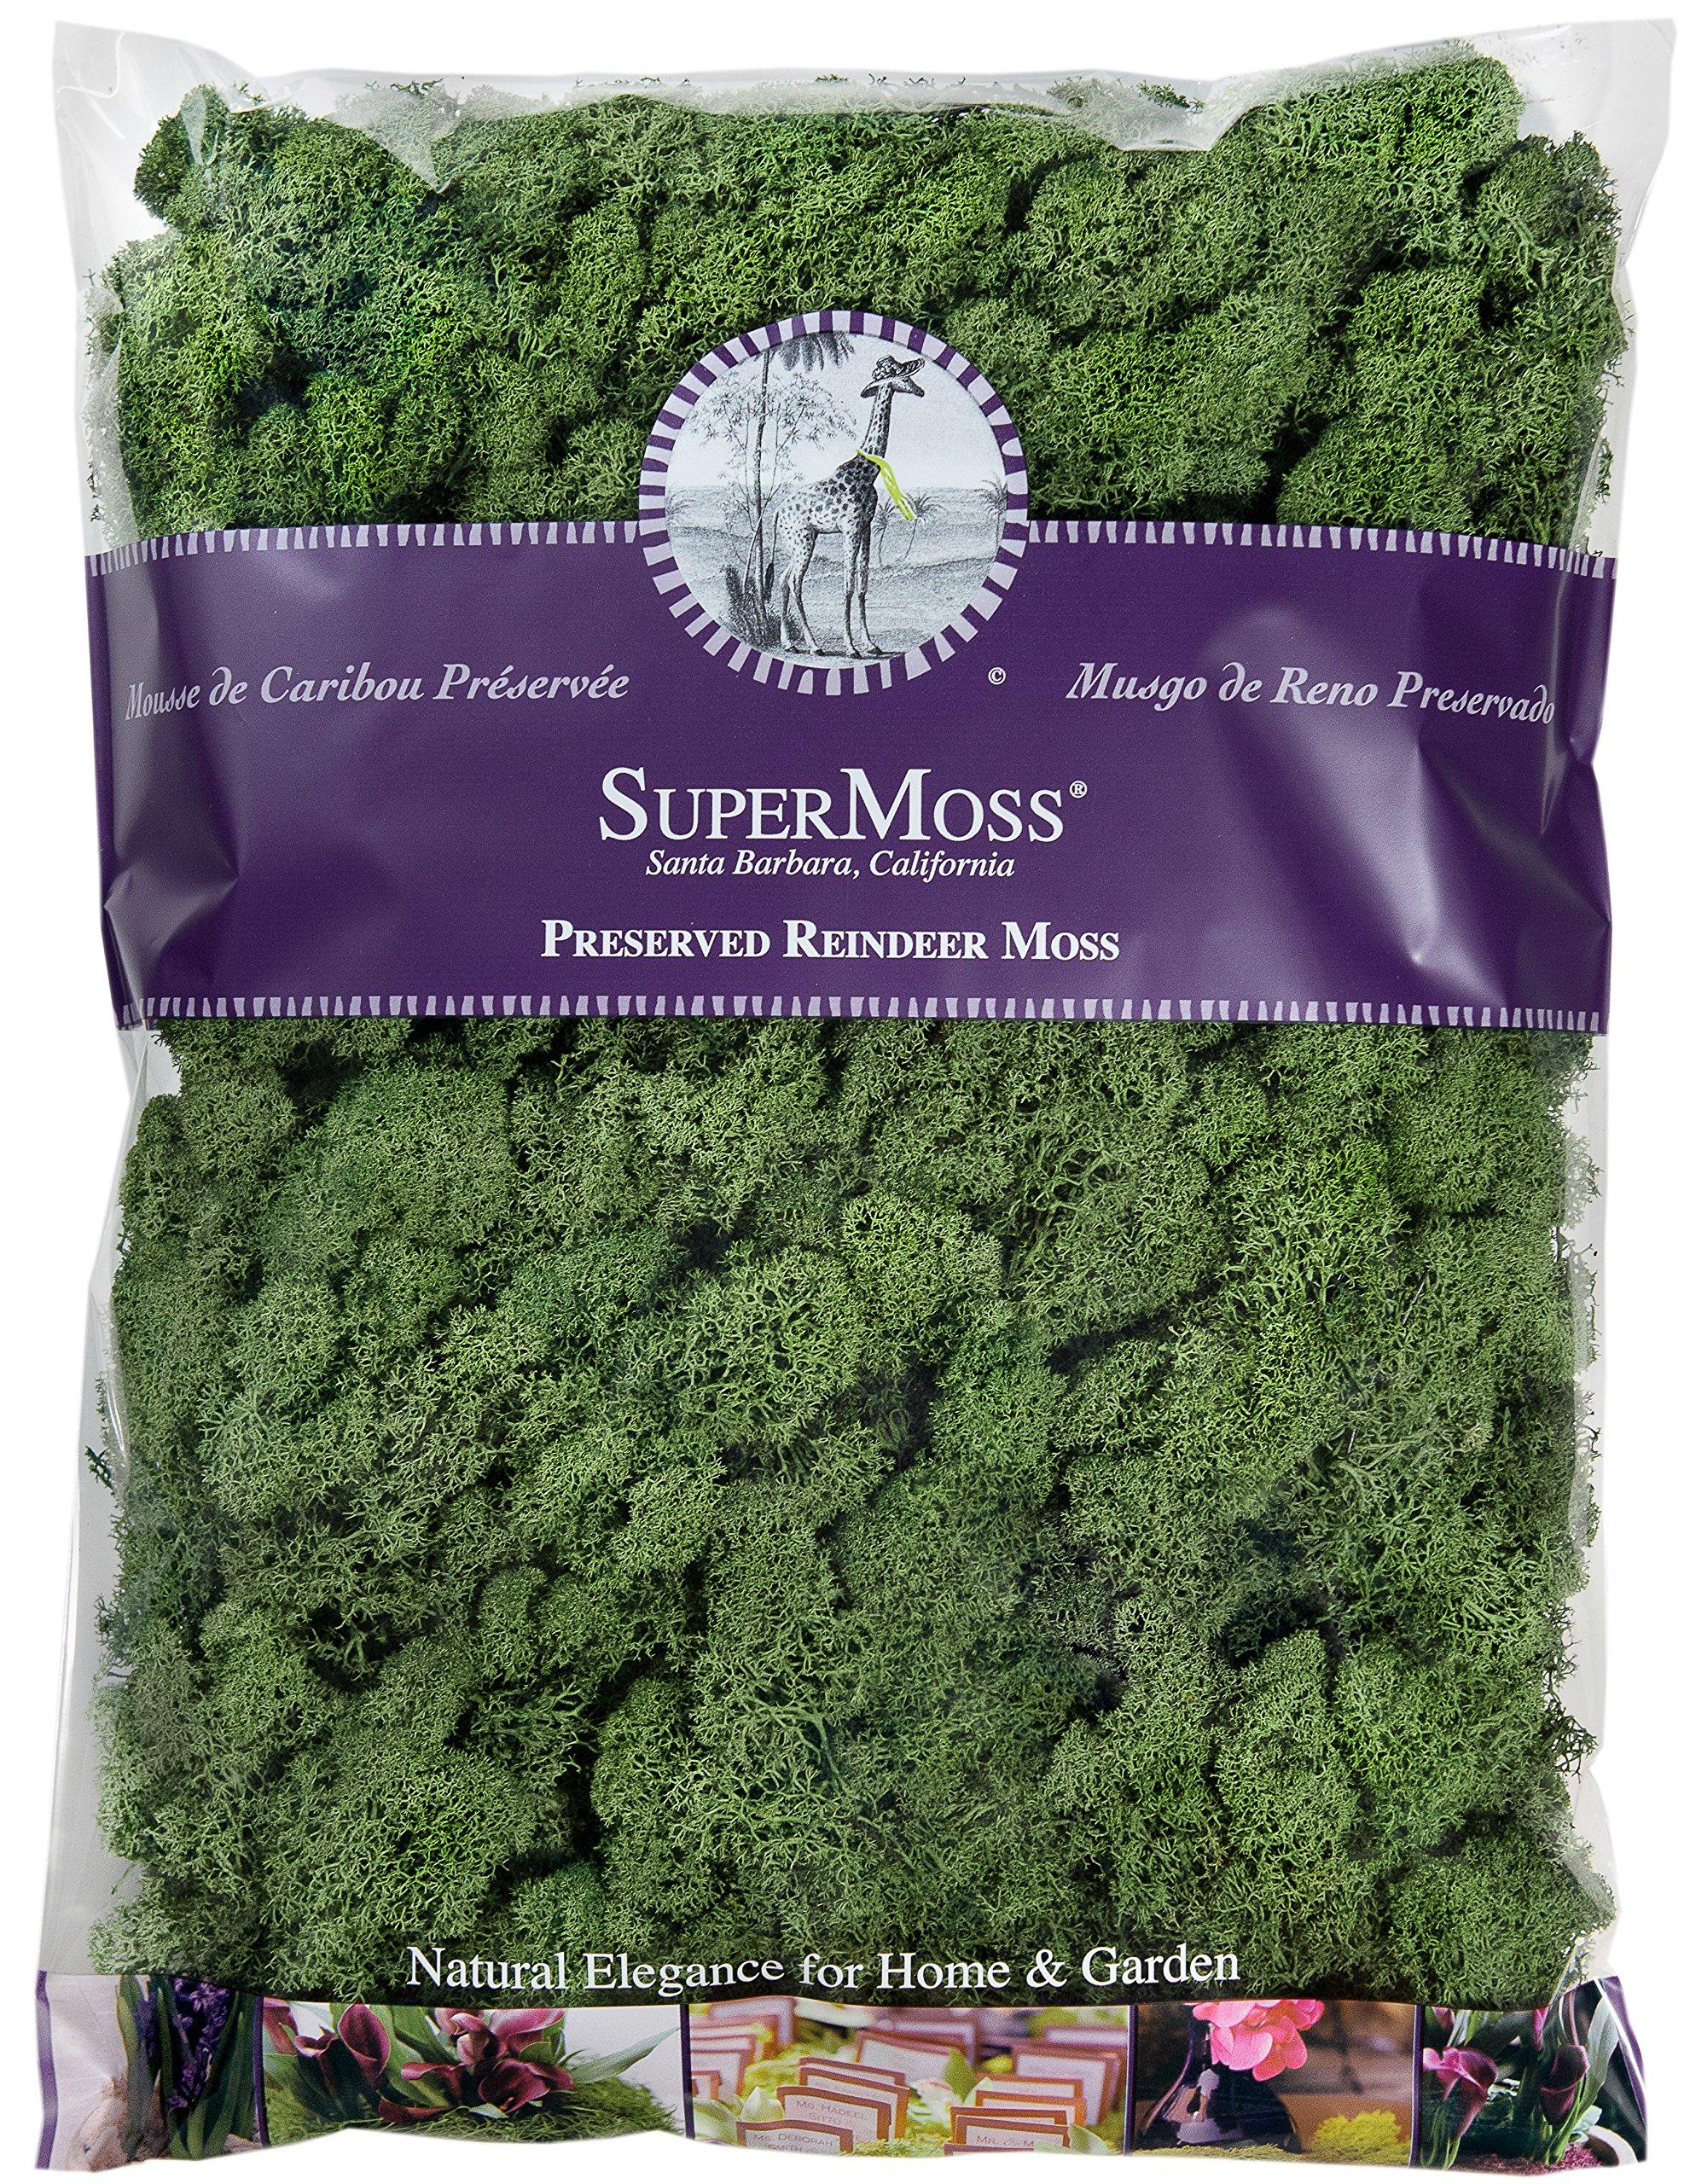 SuperMoss (25154) Reindeer Moss Preserved Bag, 16 oz, Basil